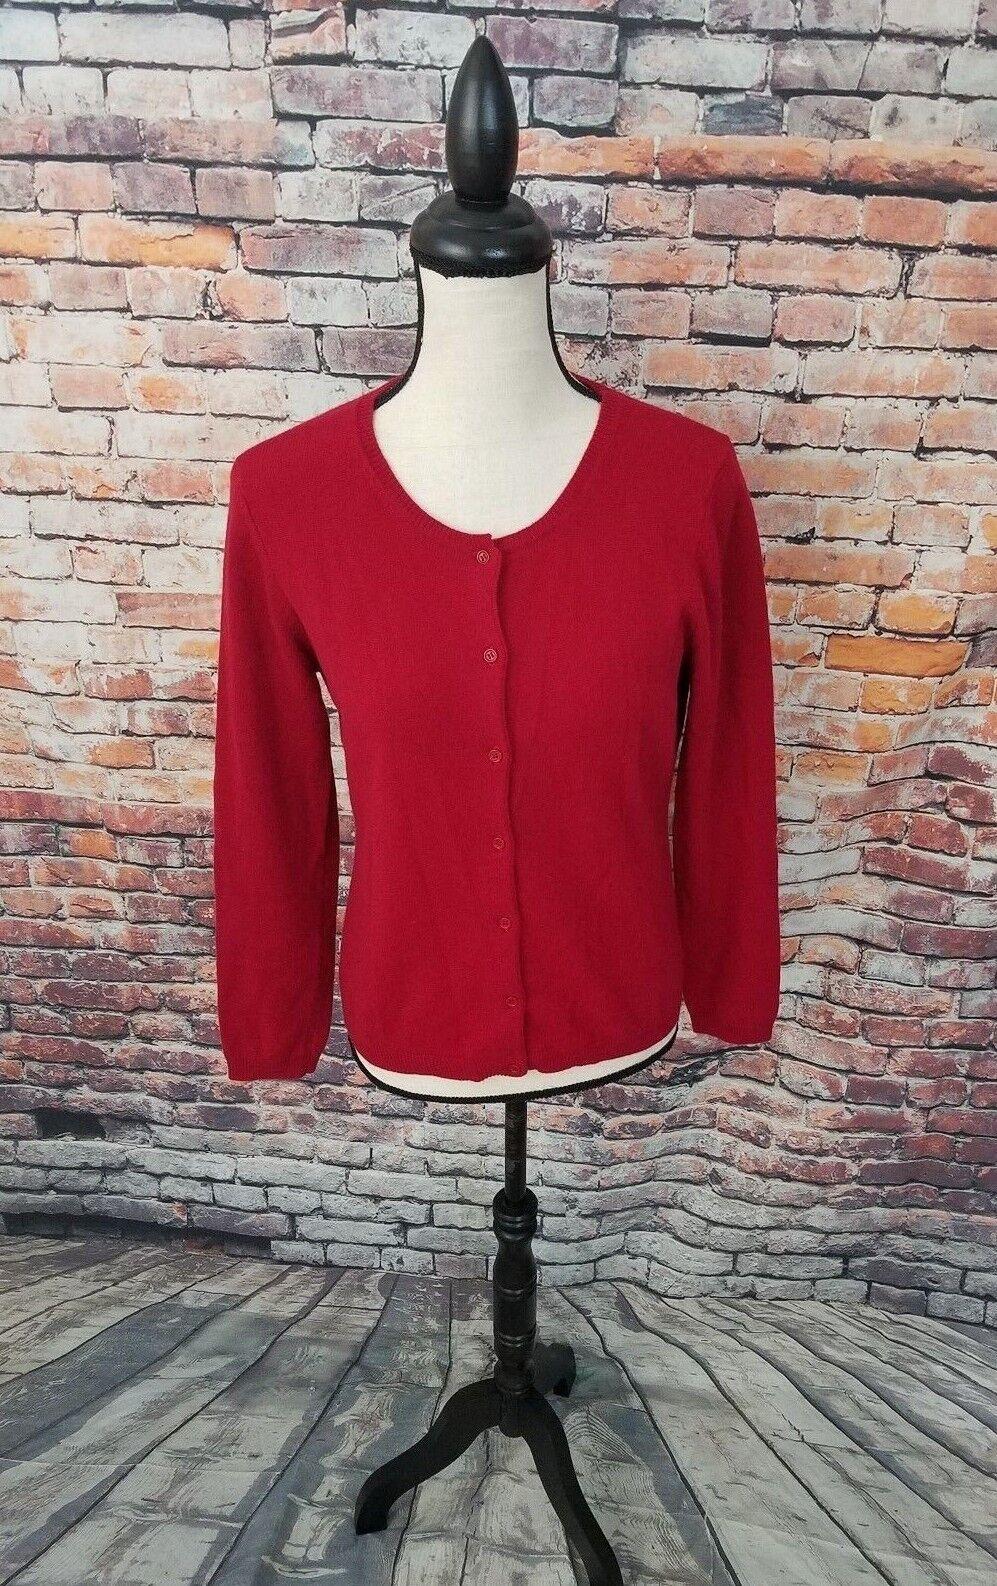 Neiman Marcus Women's Long Sleeve Red 100% CASHMERE Cardigan Sweater Sz S EUC